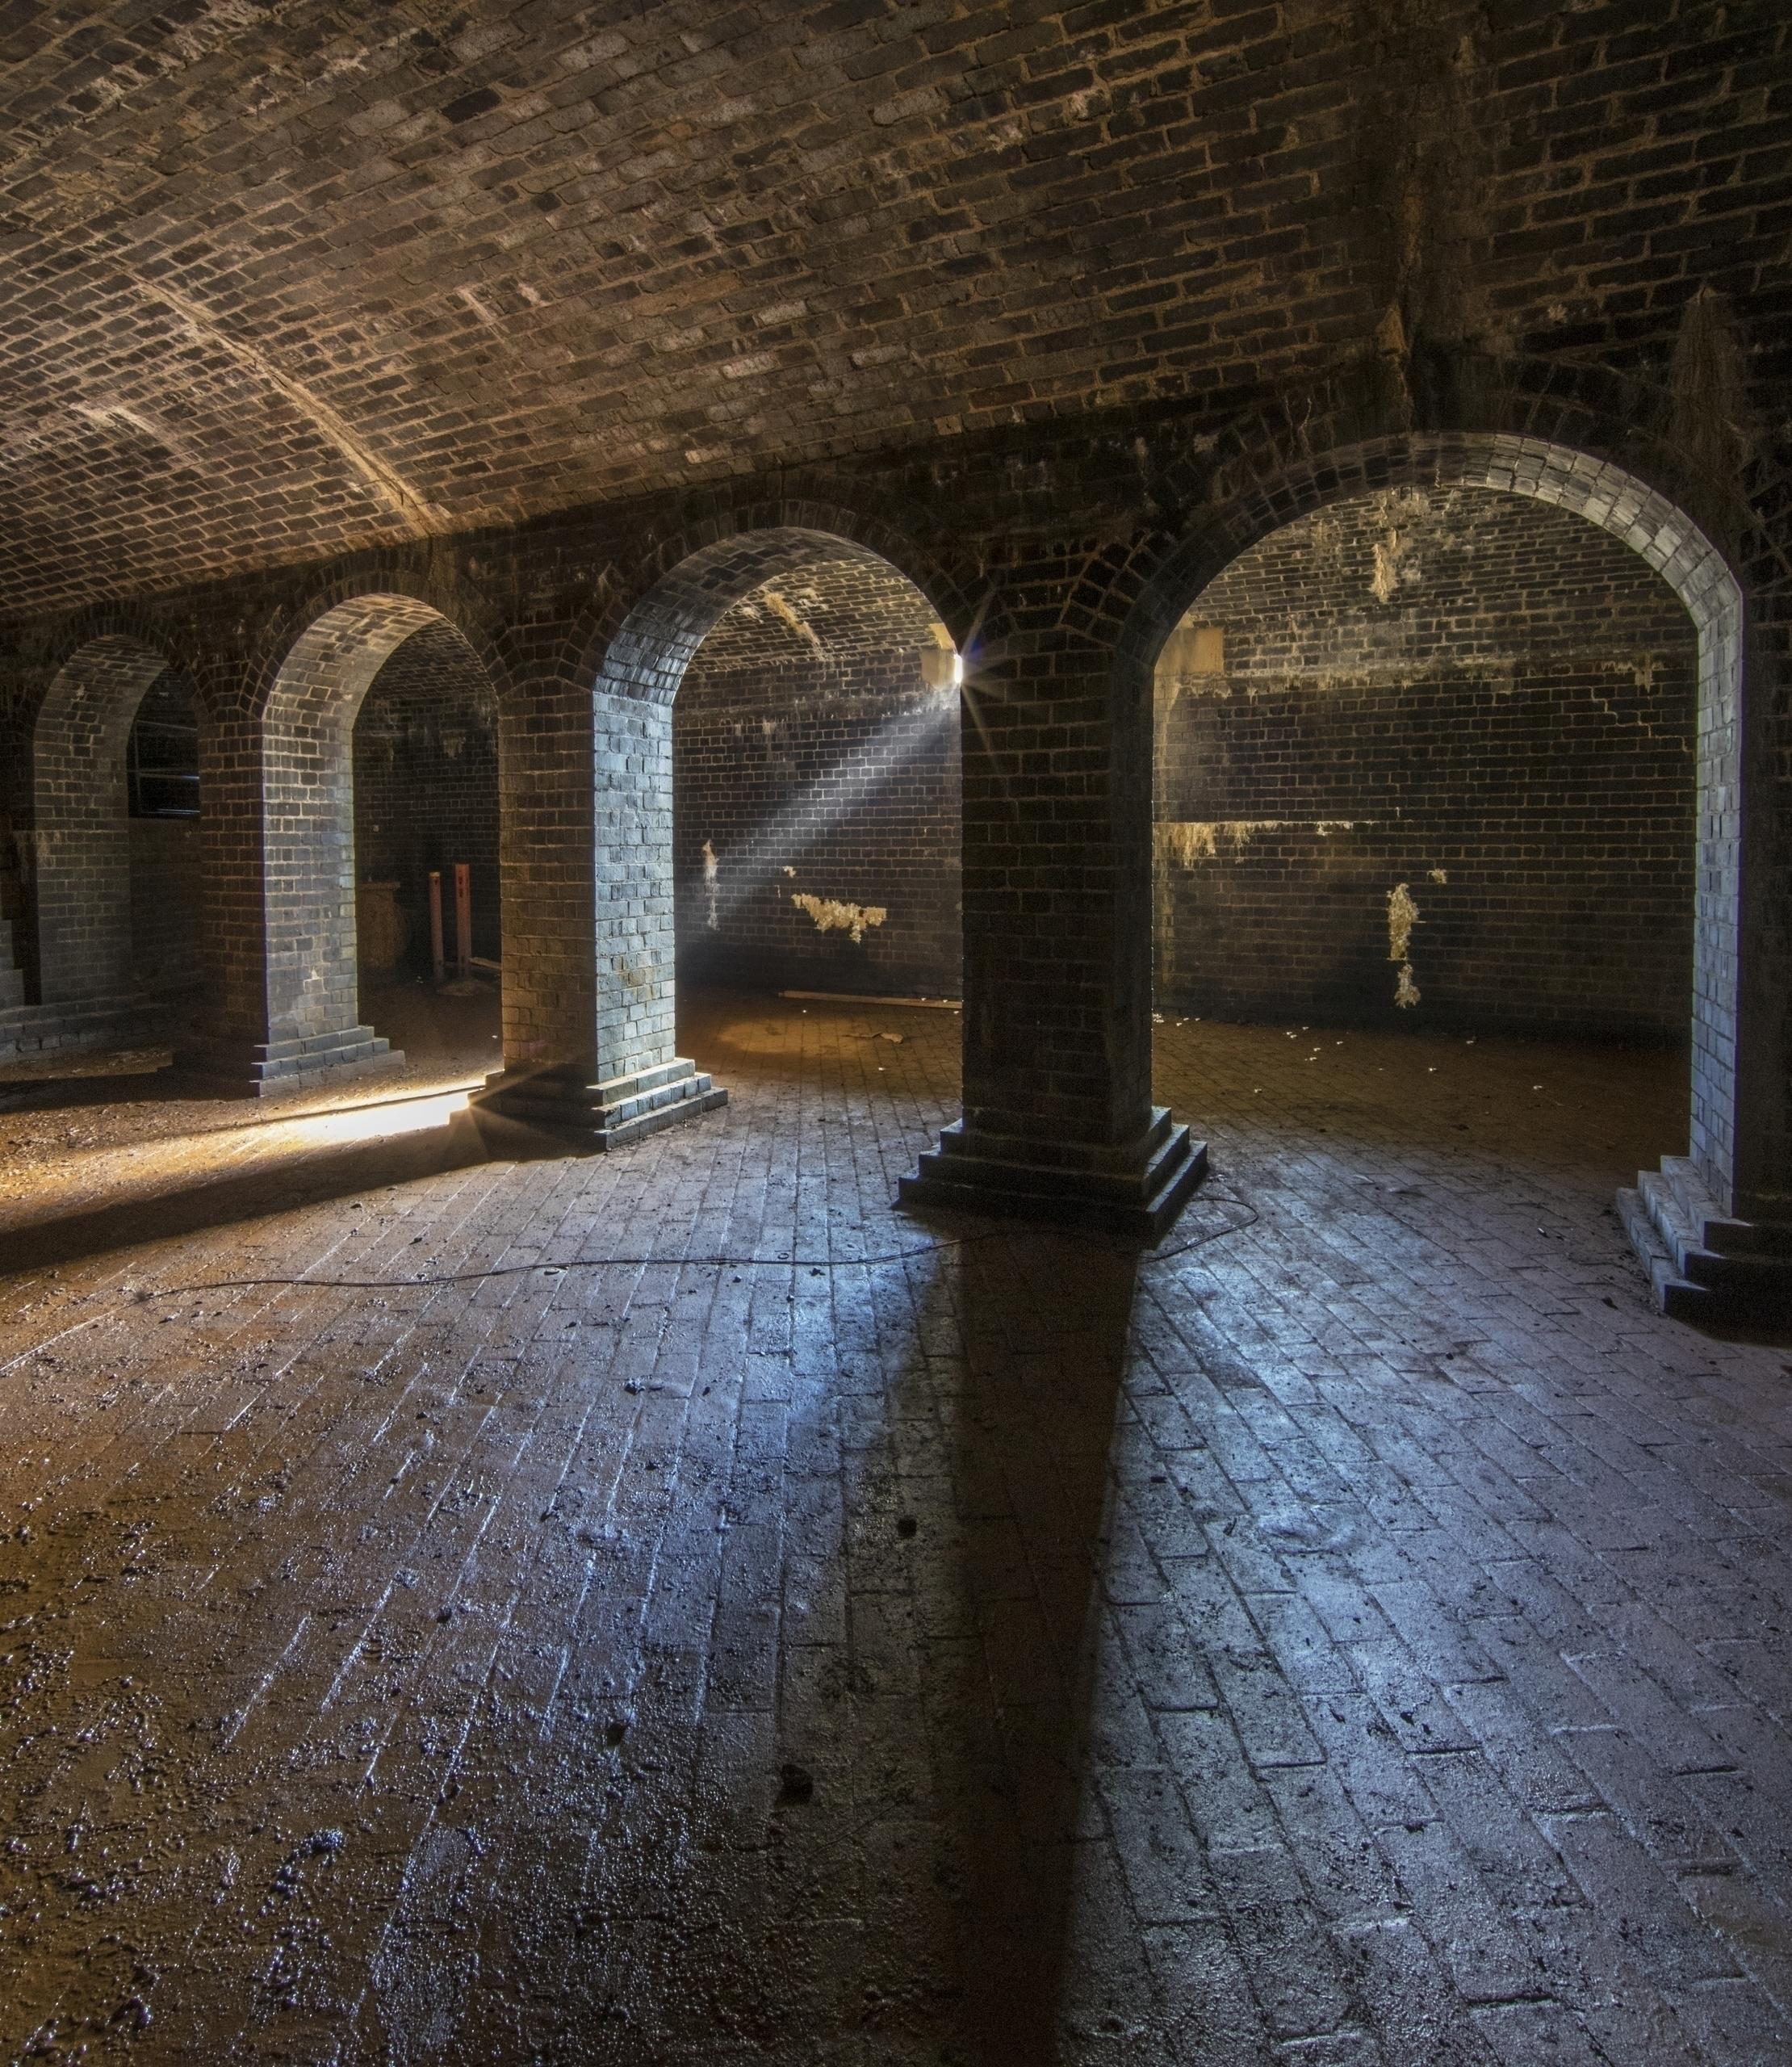 interior Victorian era subterra - forgottenheritage | ello